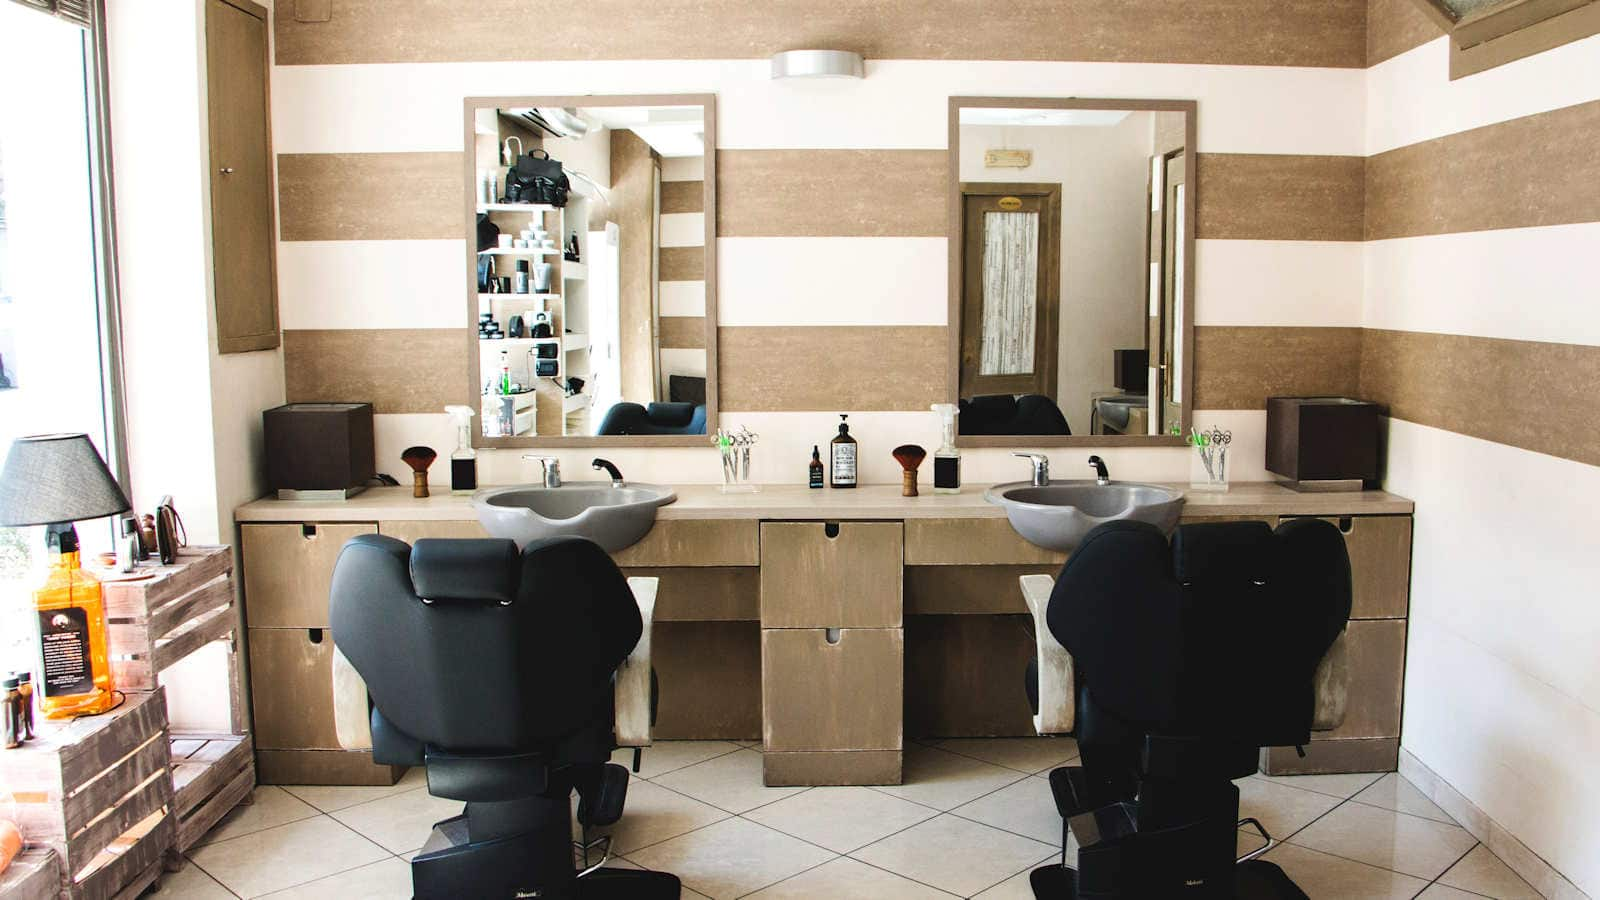 Taylorweir International School of Hairdressing of Northbridge